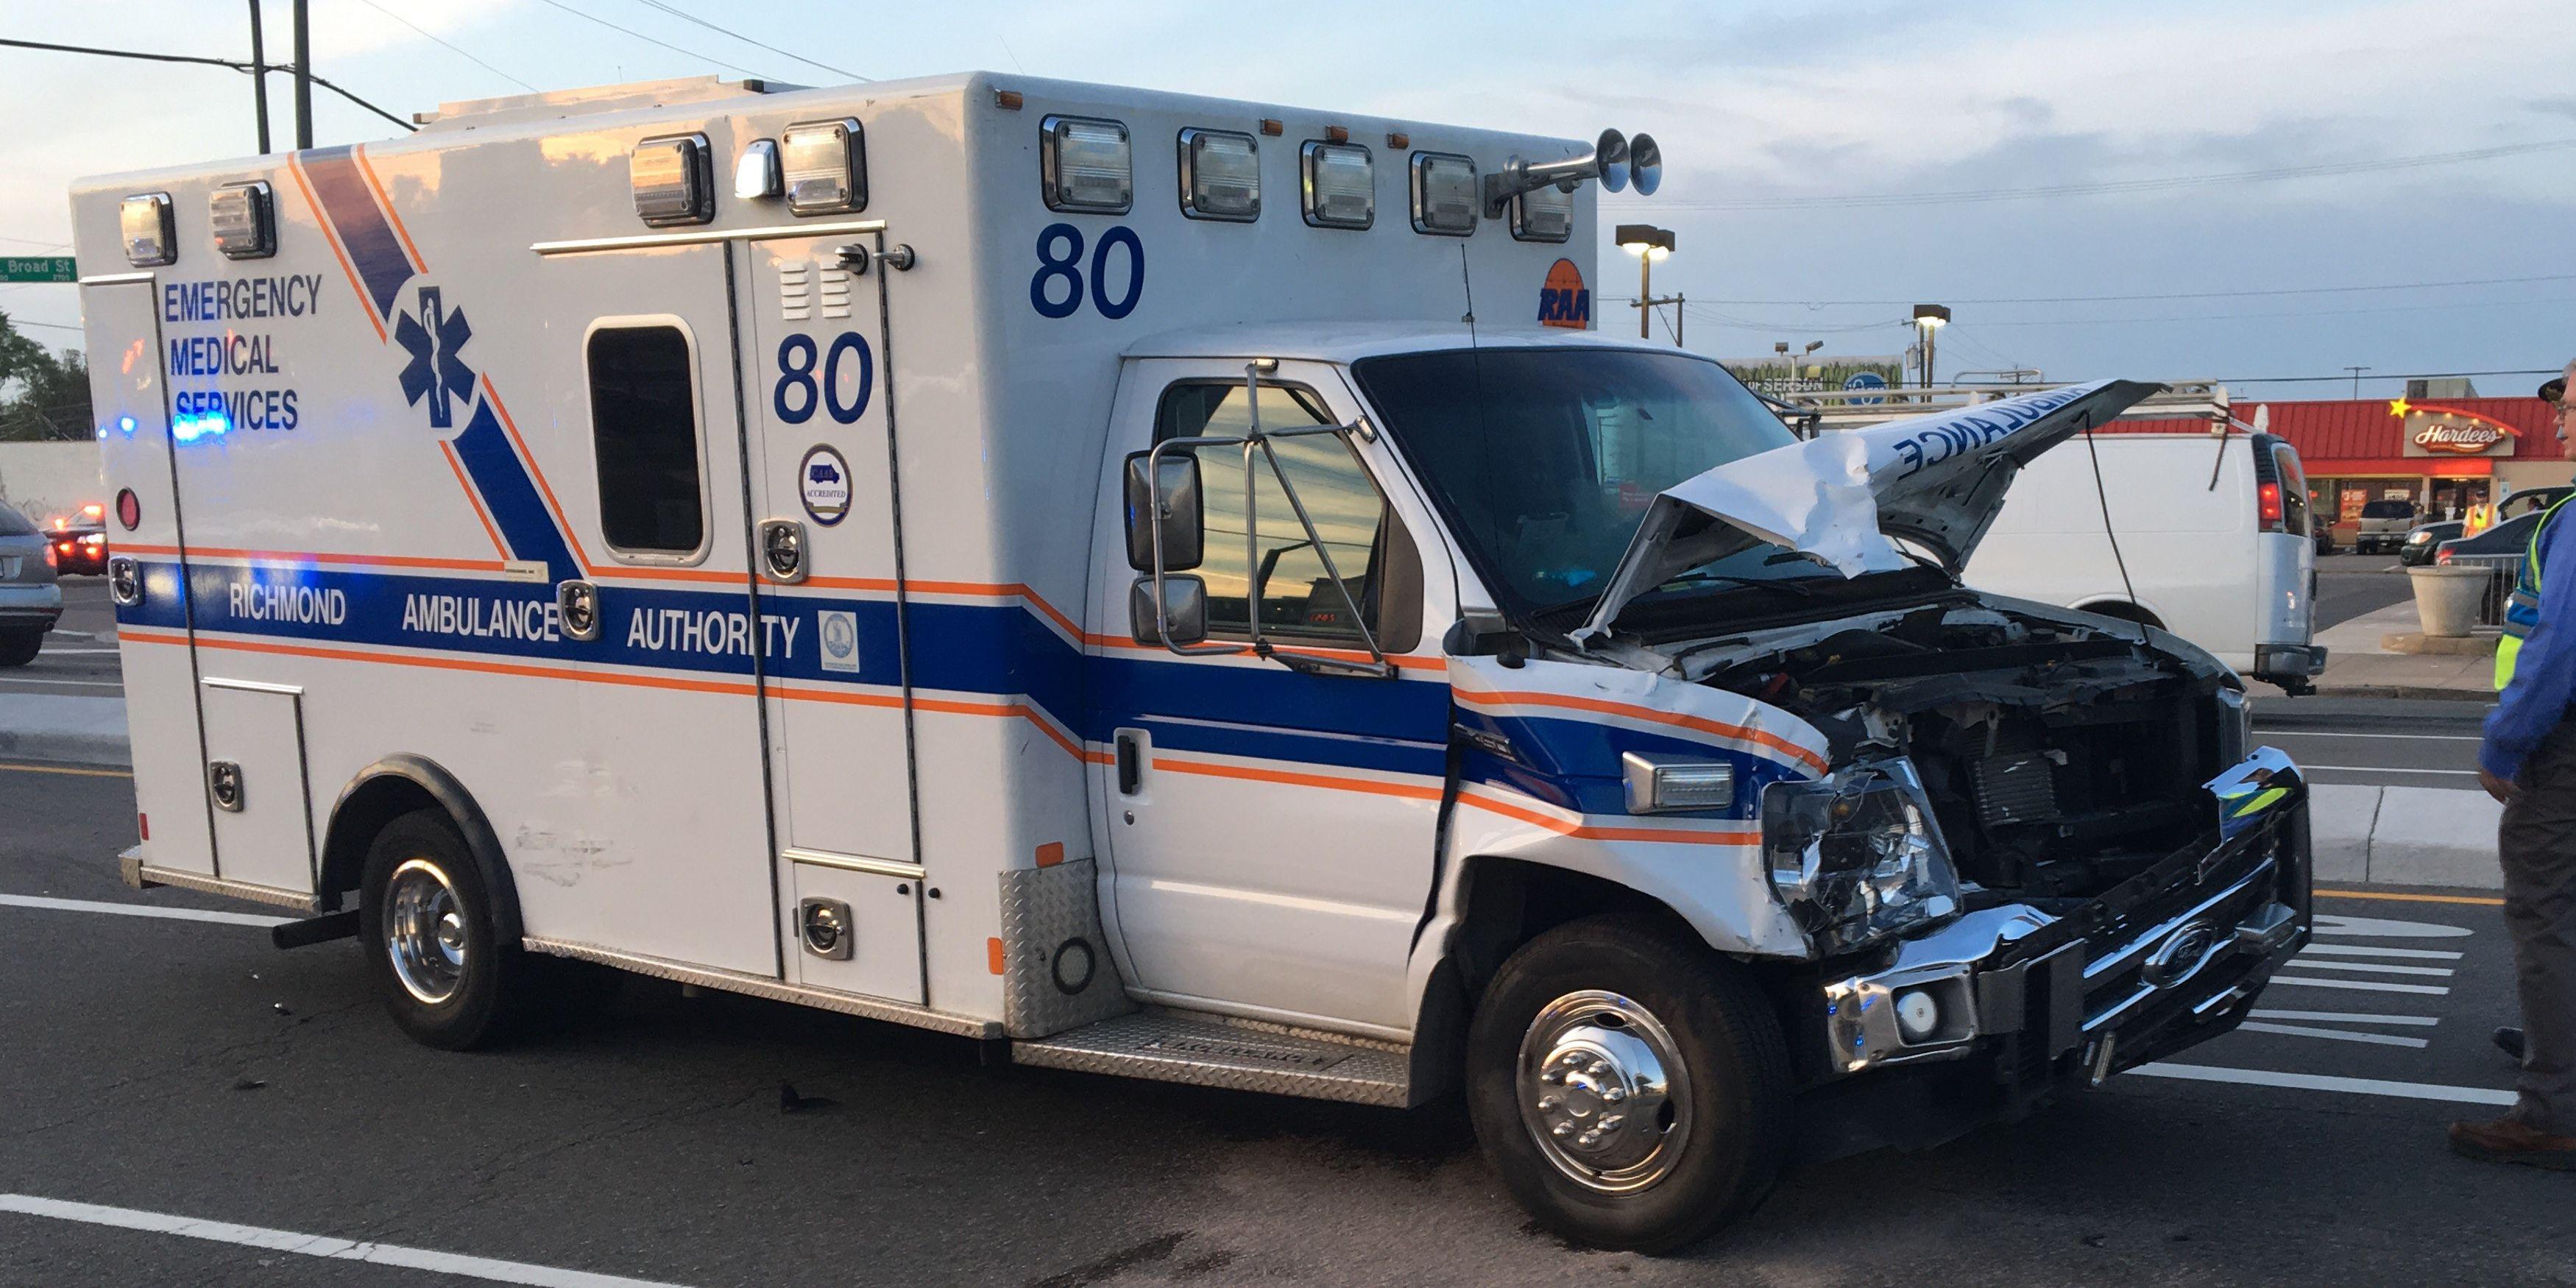 4 injured in crash involving Richmond ambulance